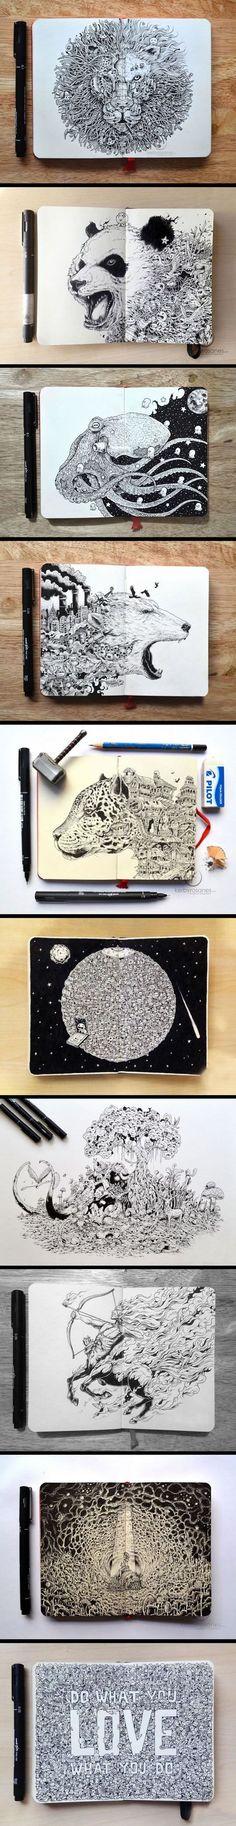 doodle art : 네이버 블로그